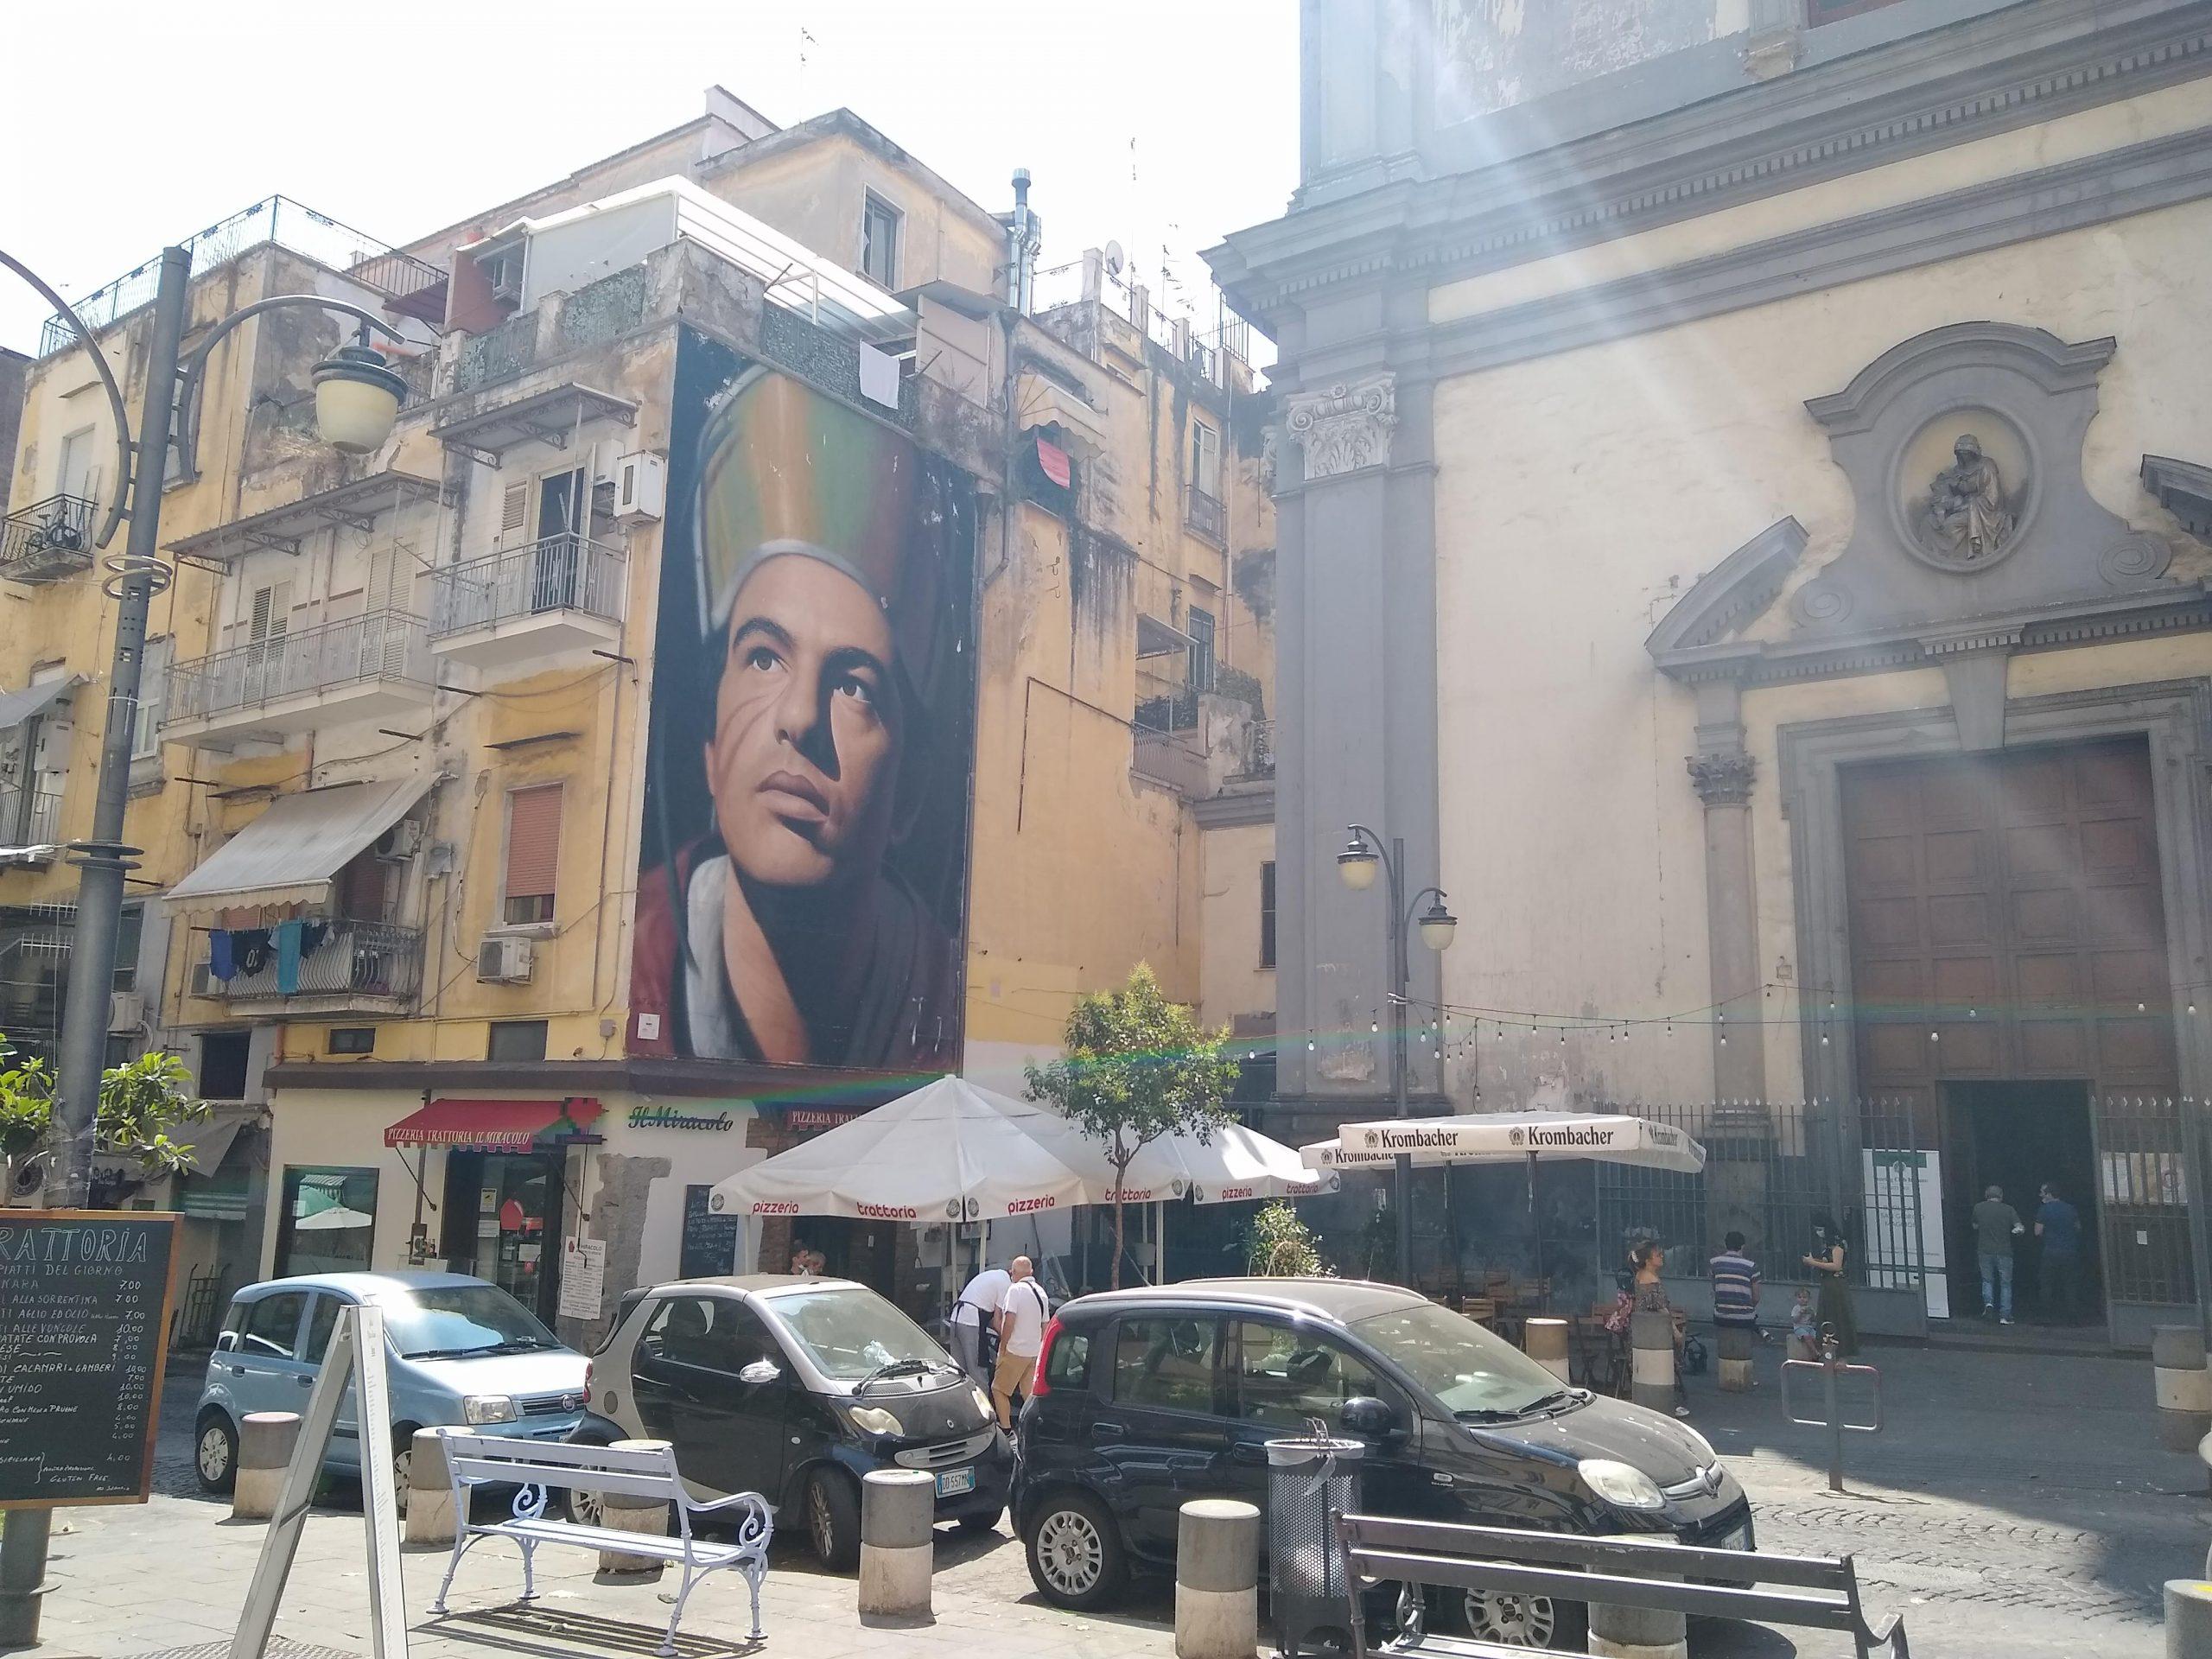 San Gennaro, by Jorit